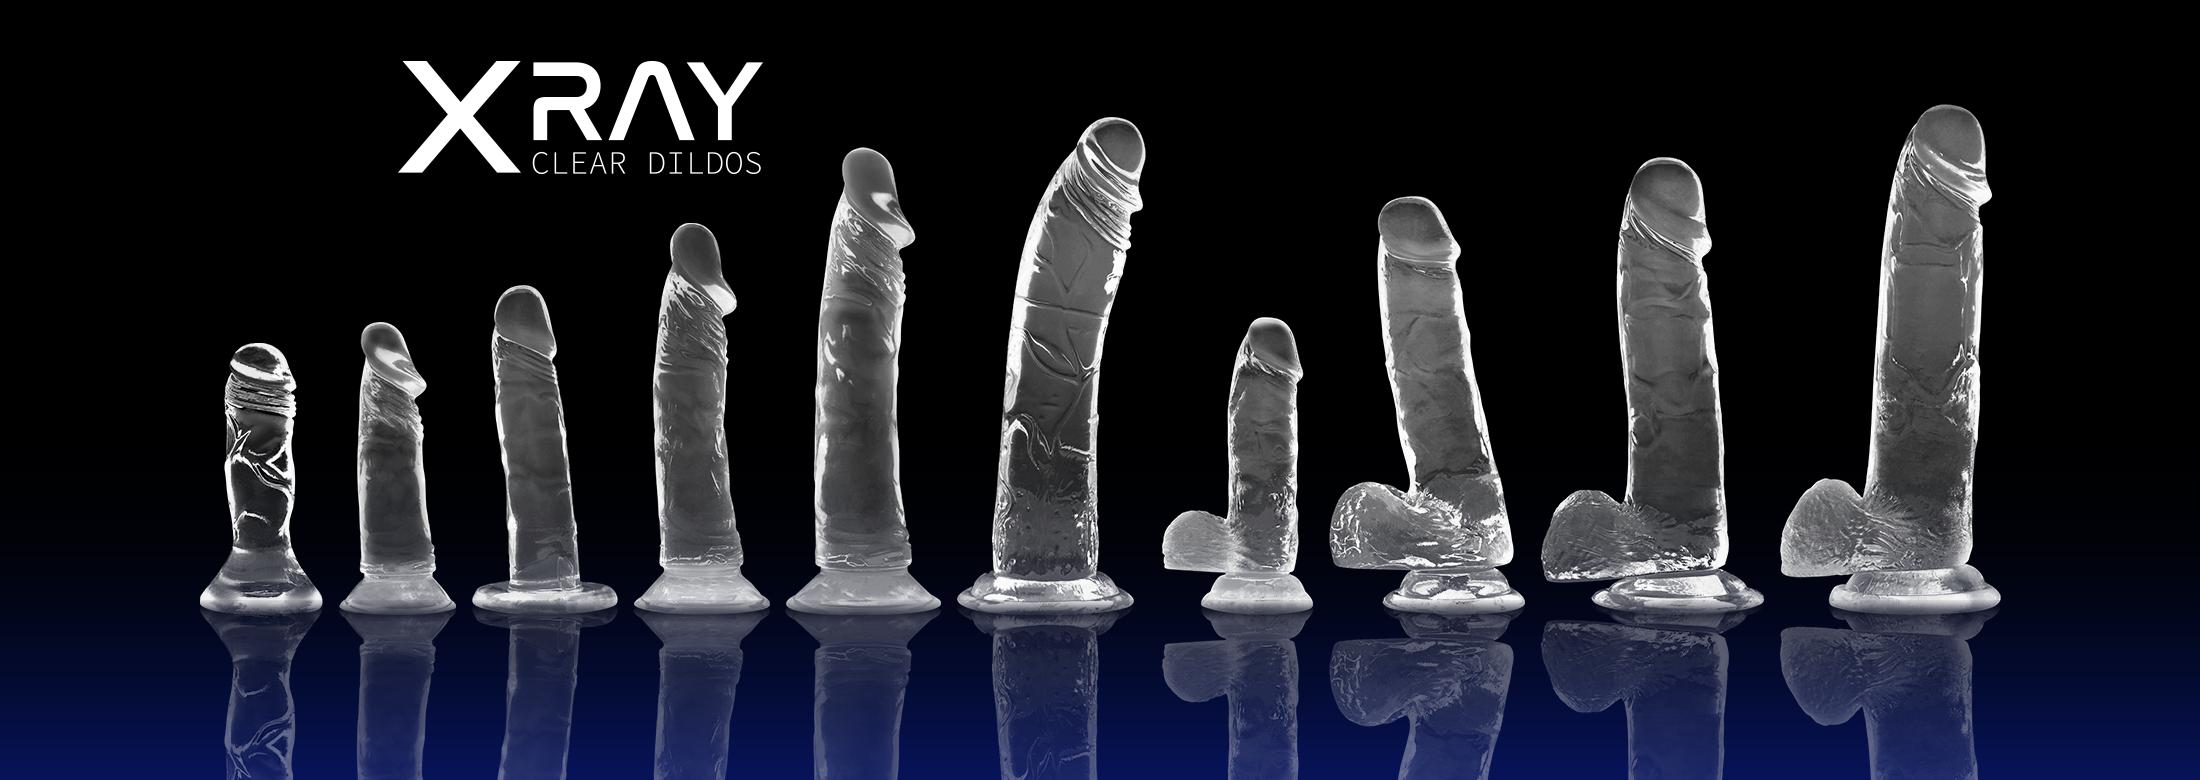 Xray Clear Dildos